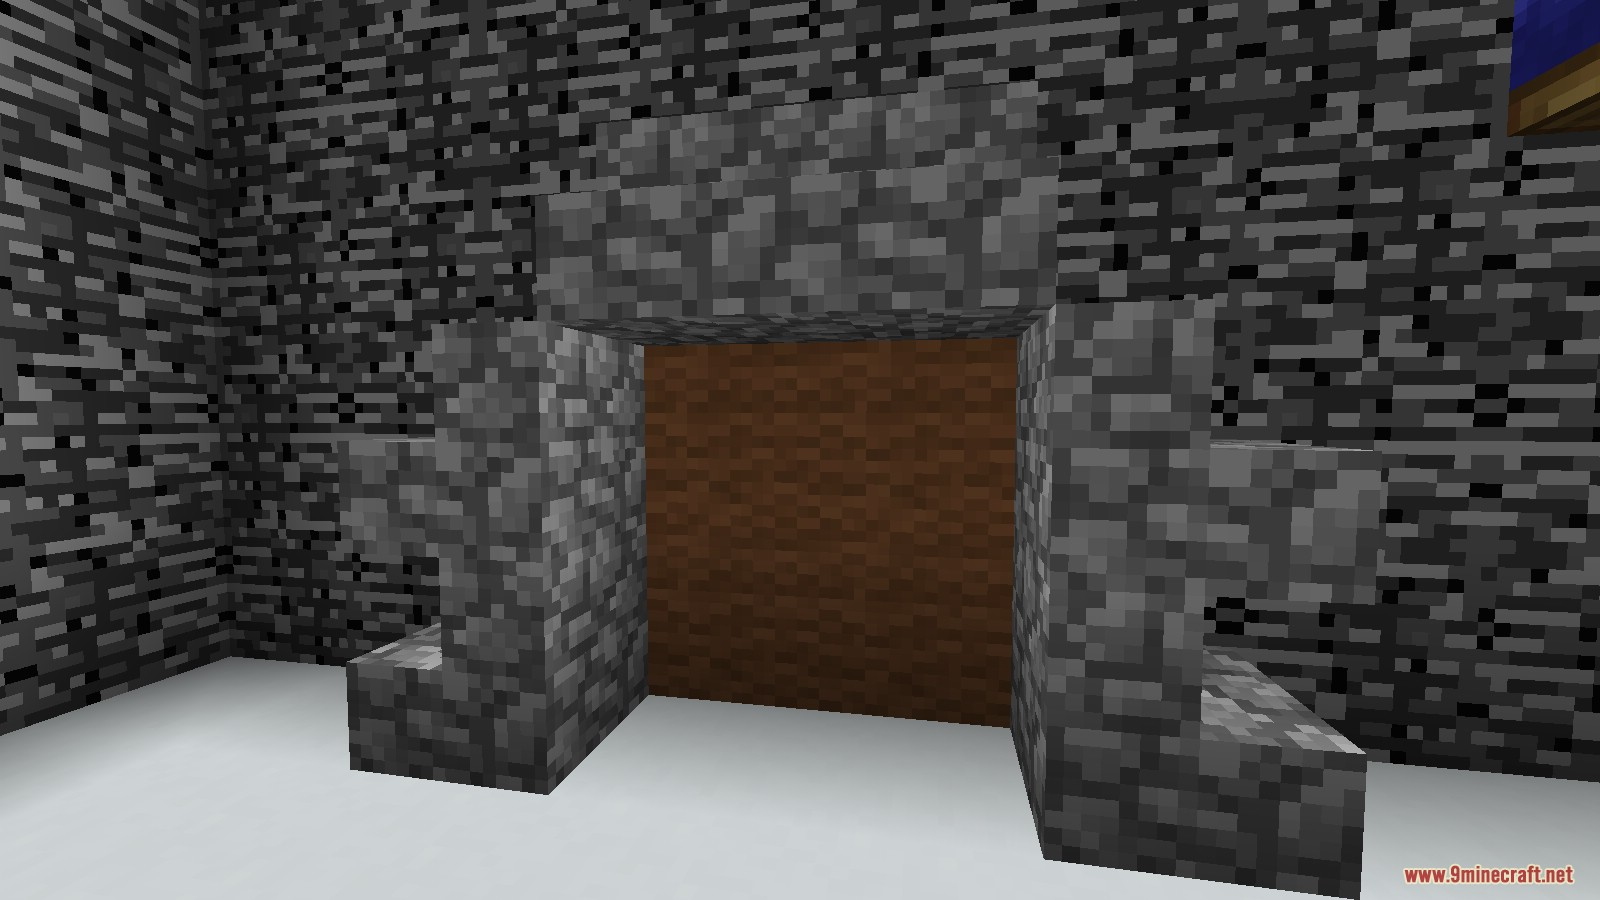 10x10x10 Cube Map Screenshots (5)